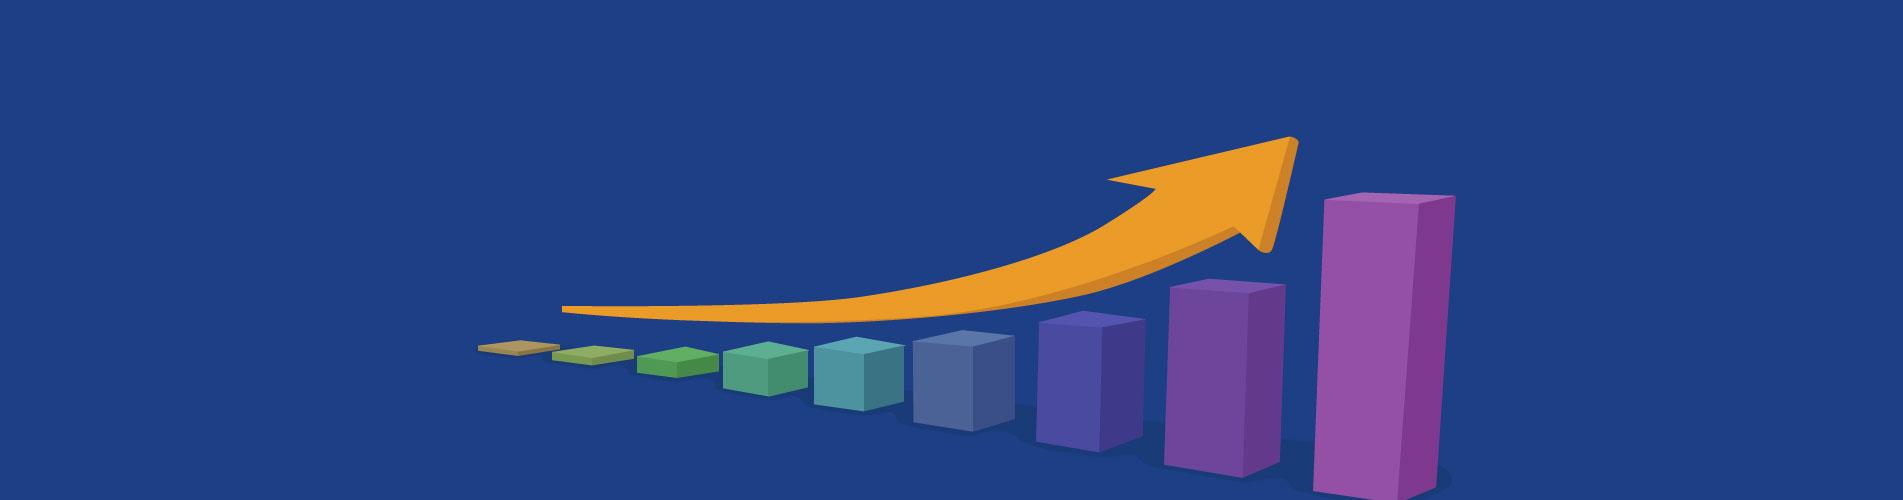 yellow arrow over graph